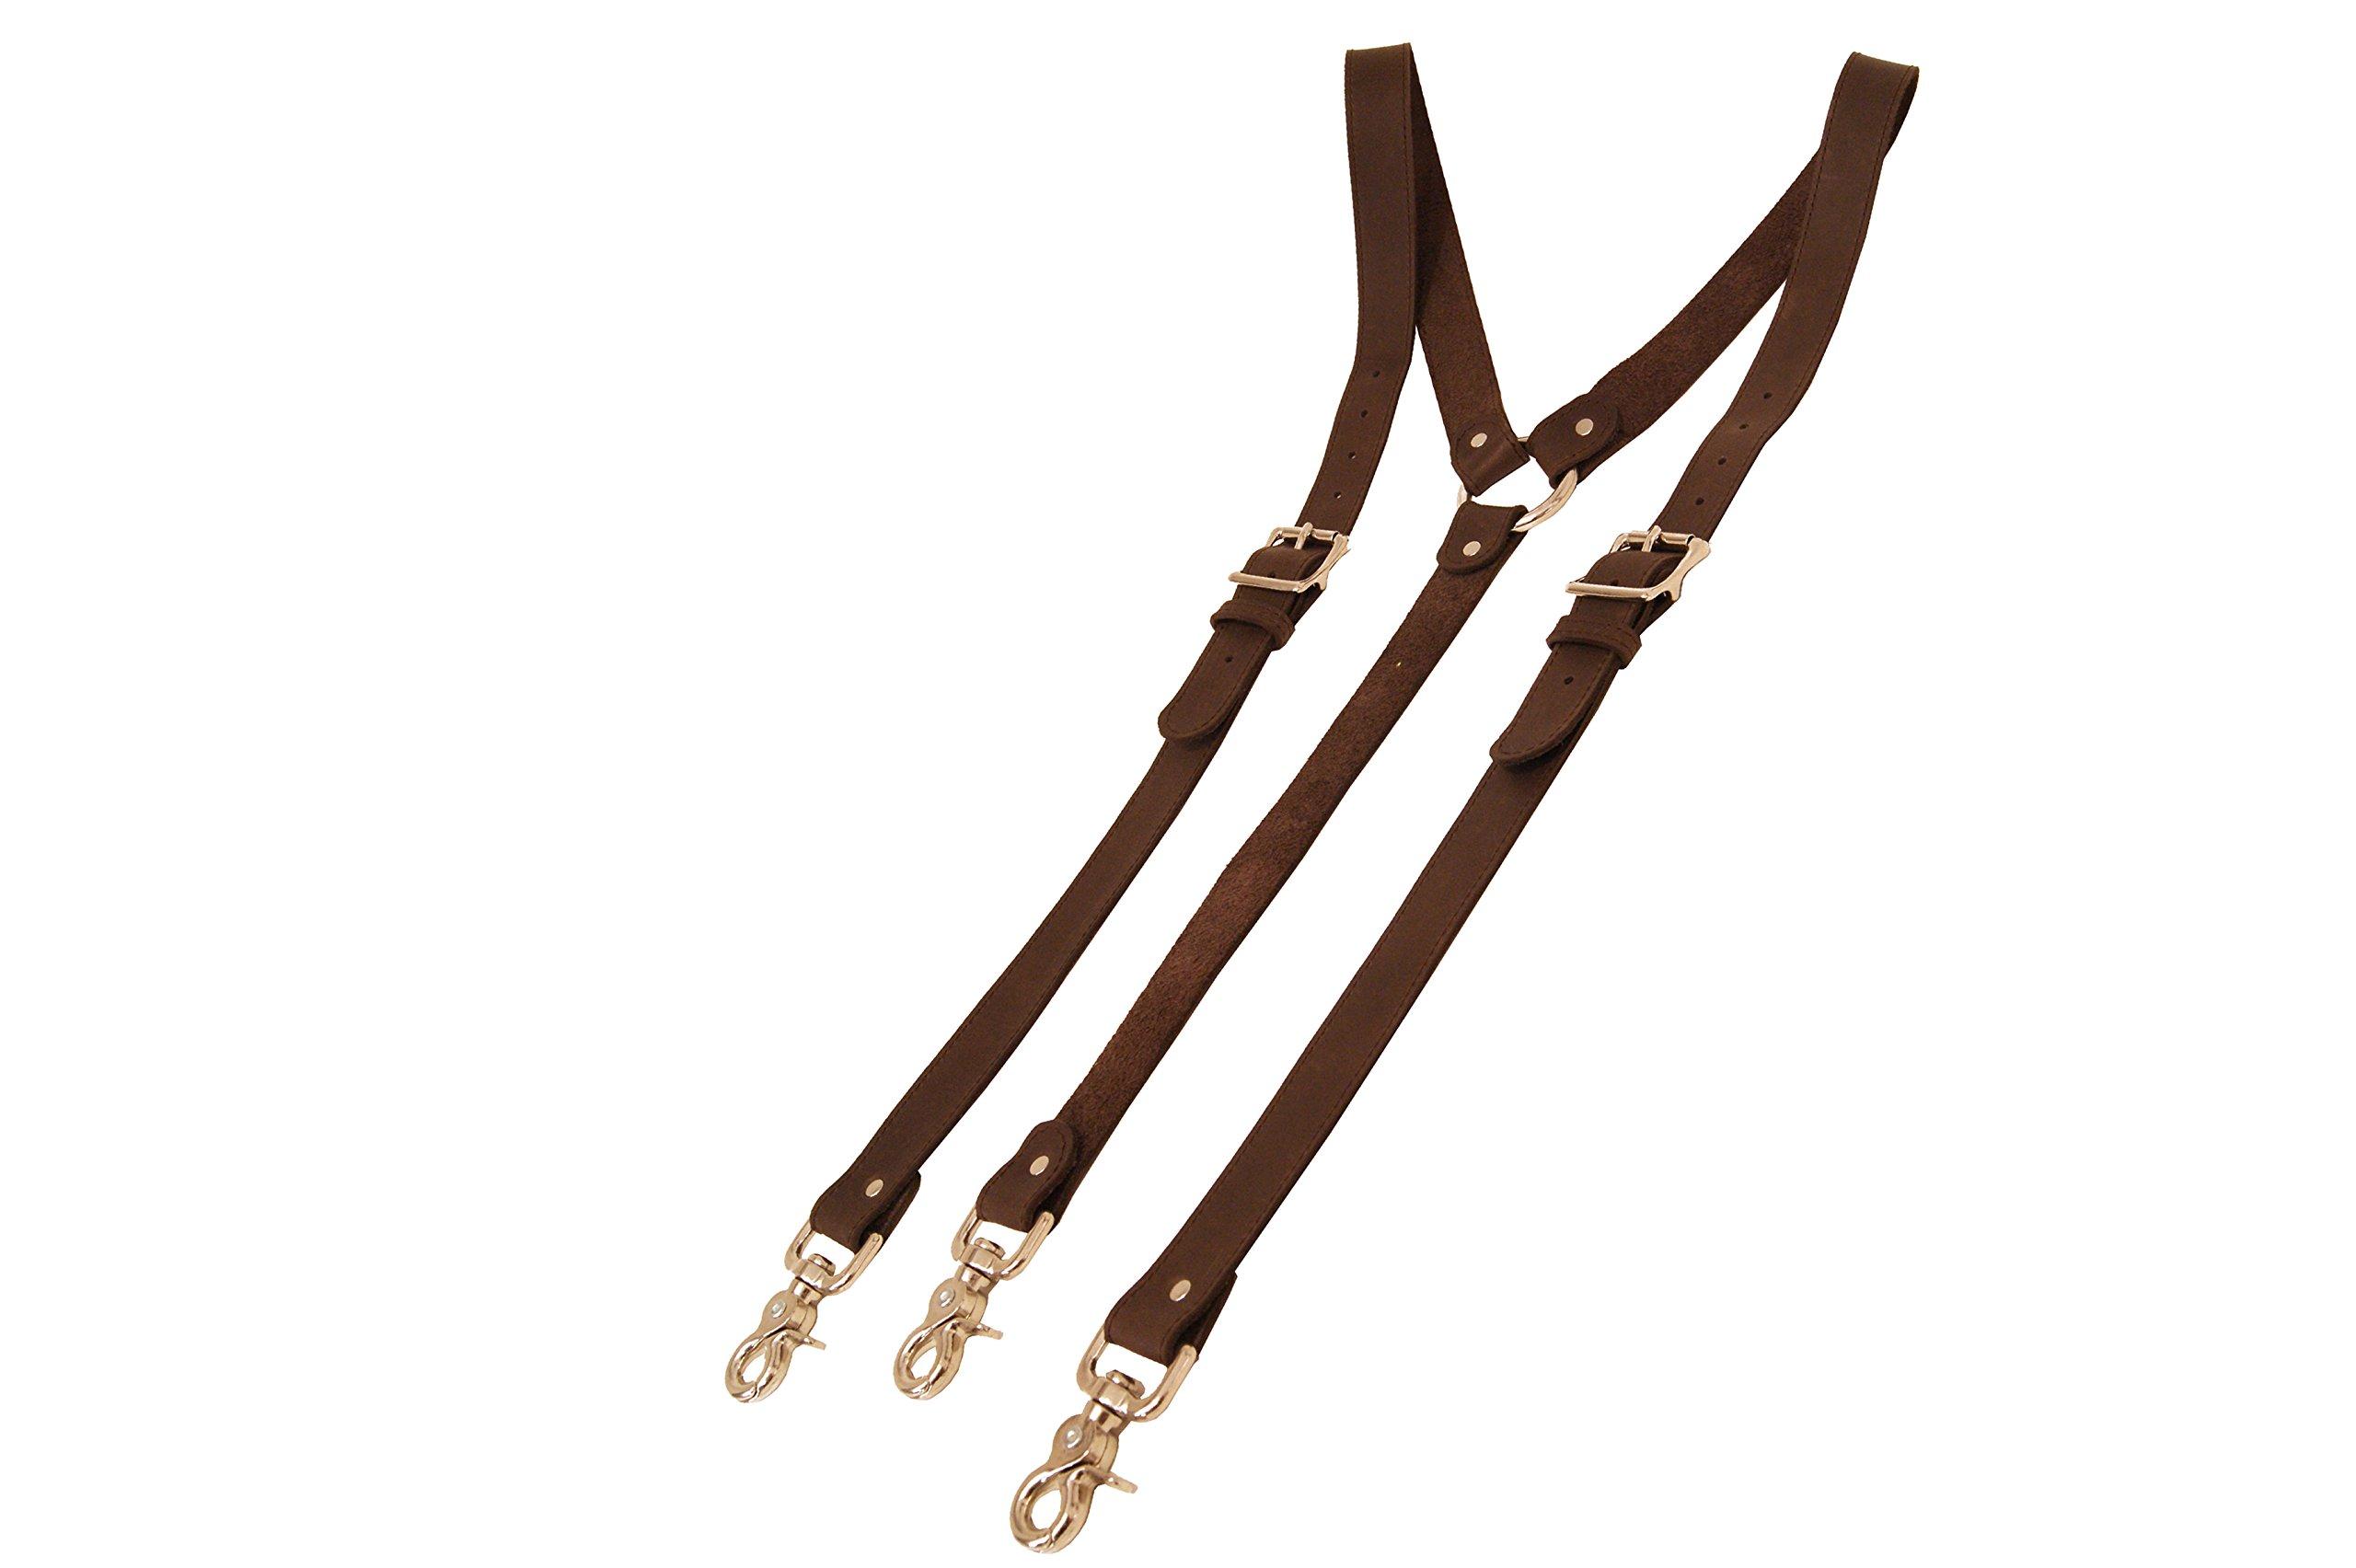 Project Transaction Men's Leather Suspenders M/L Dark Brown/Nickel Trigger Snaps